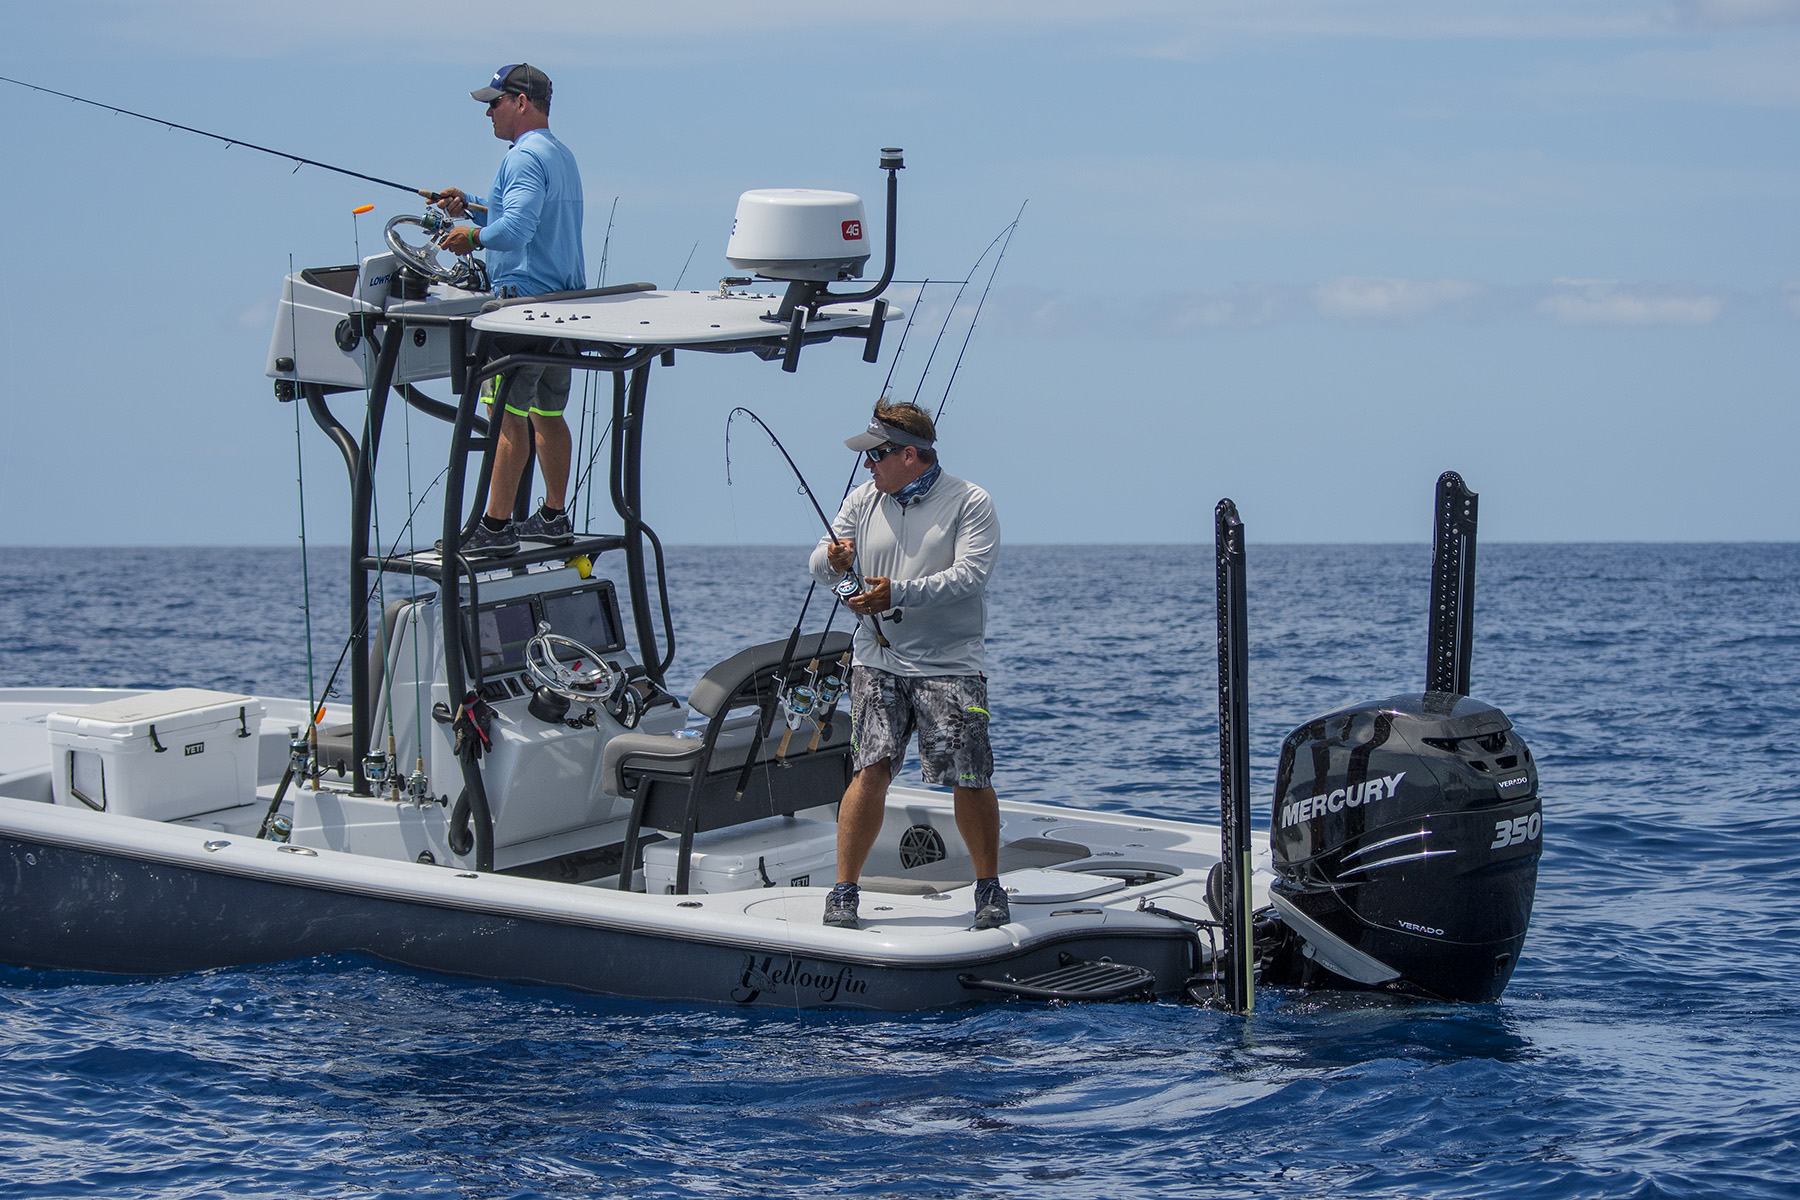 tom-rowland-and-rich-tudor-fish-using-their-motorguide-power-poles-mercury-verado-and-yellowfin-bay-boat